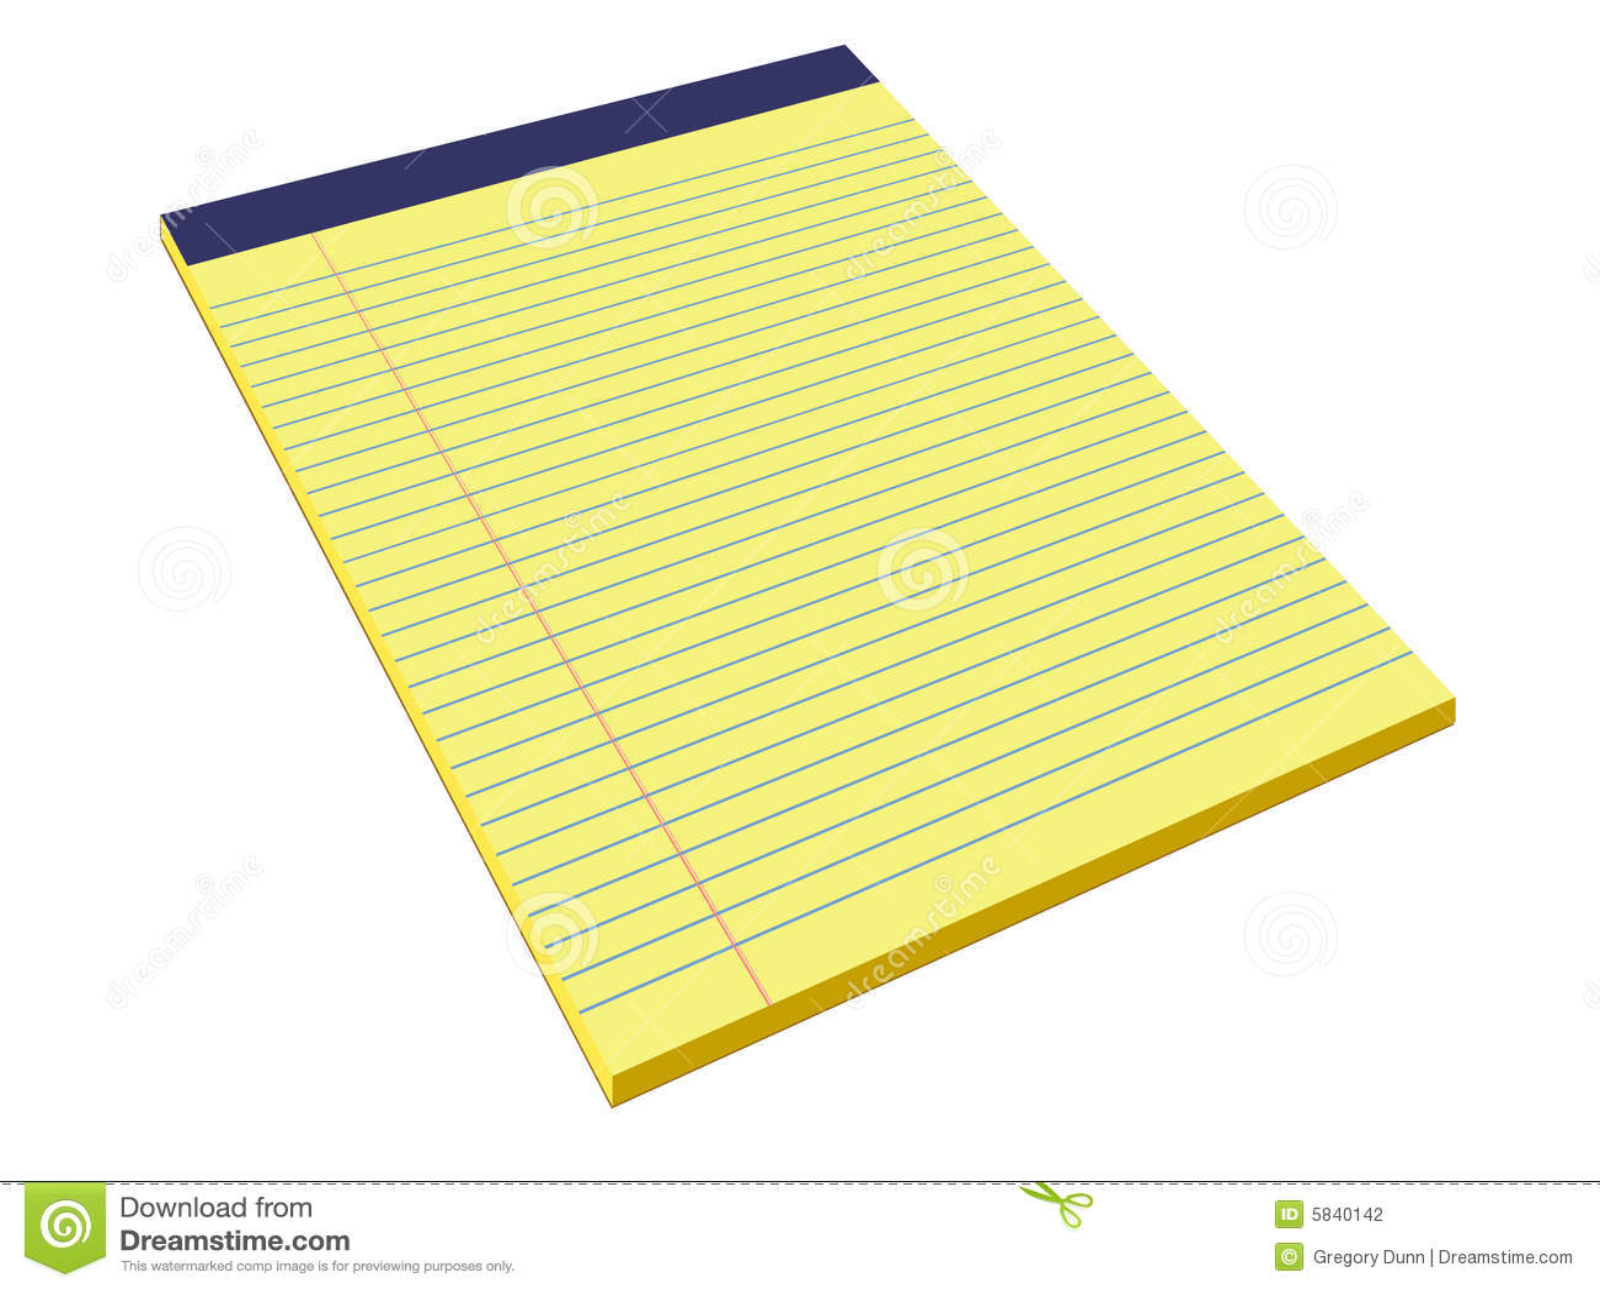 yellow legal pad stock illustration. illustration of margin - 5840142